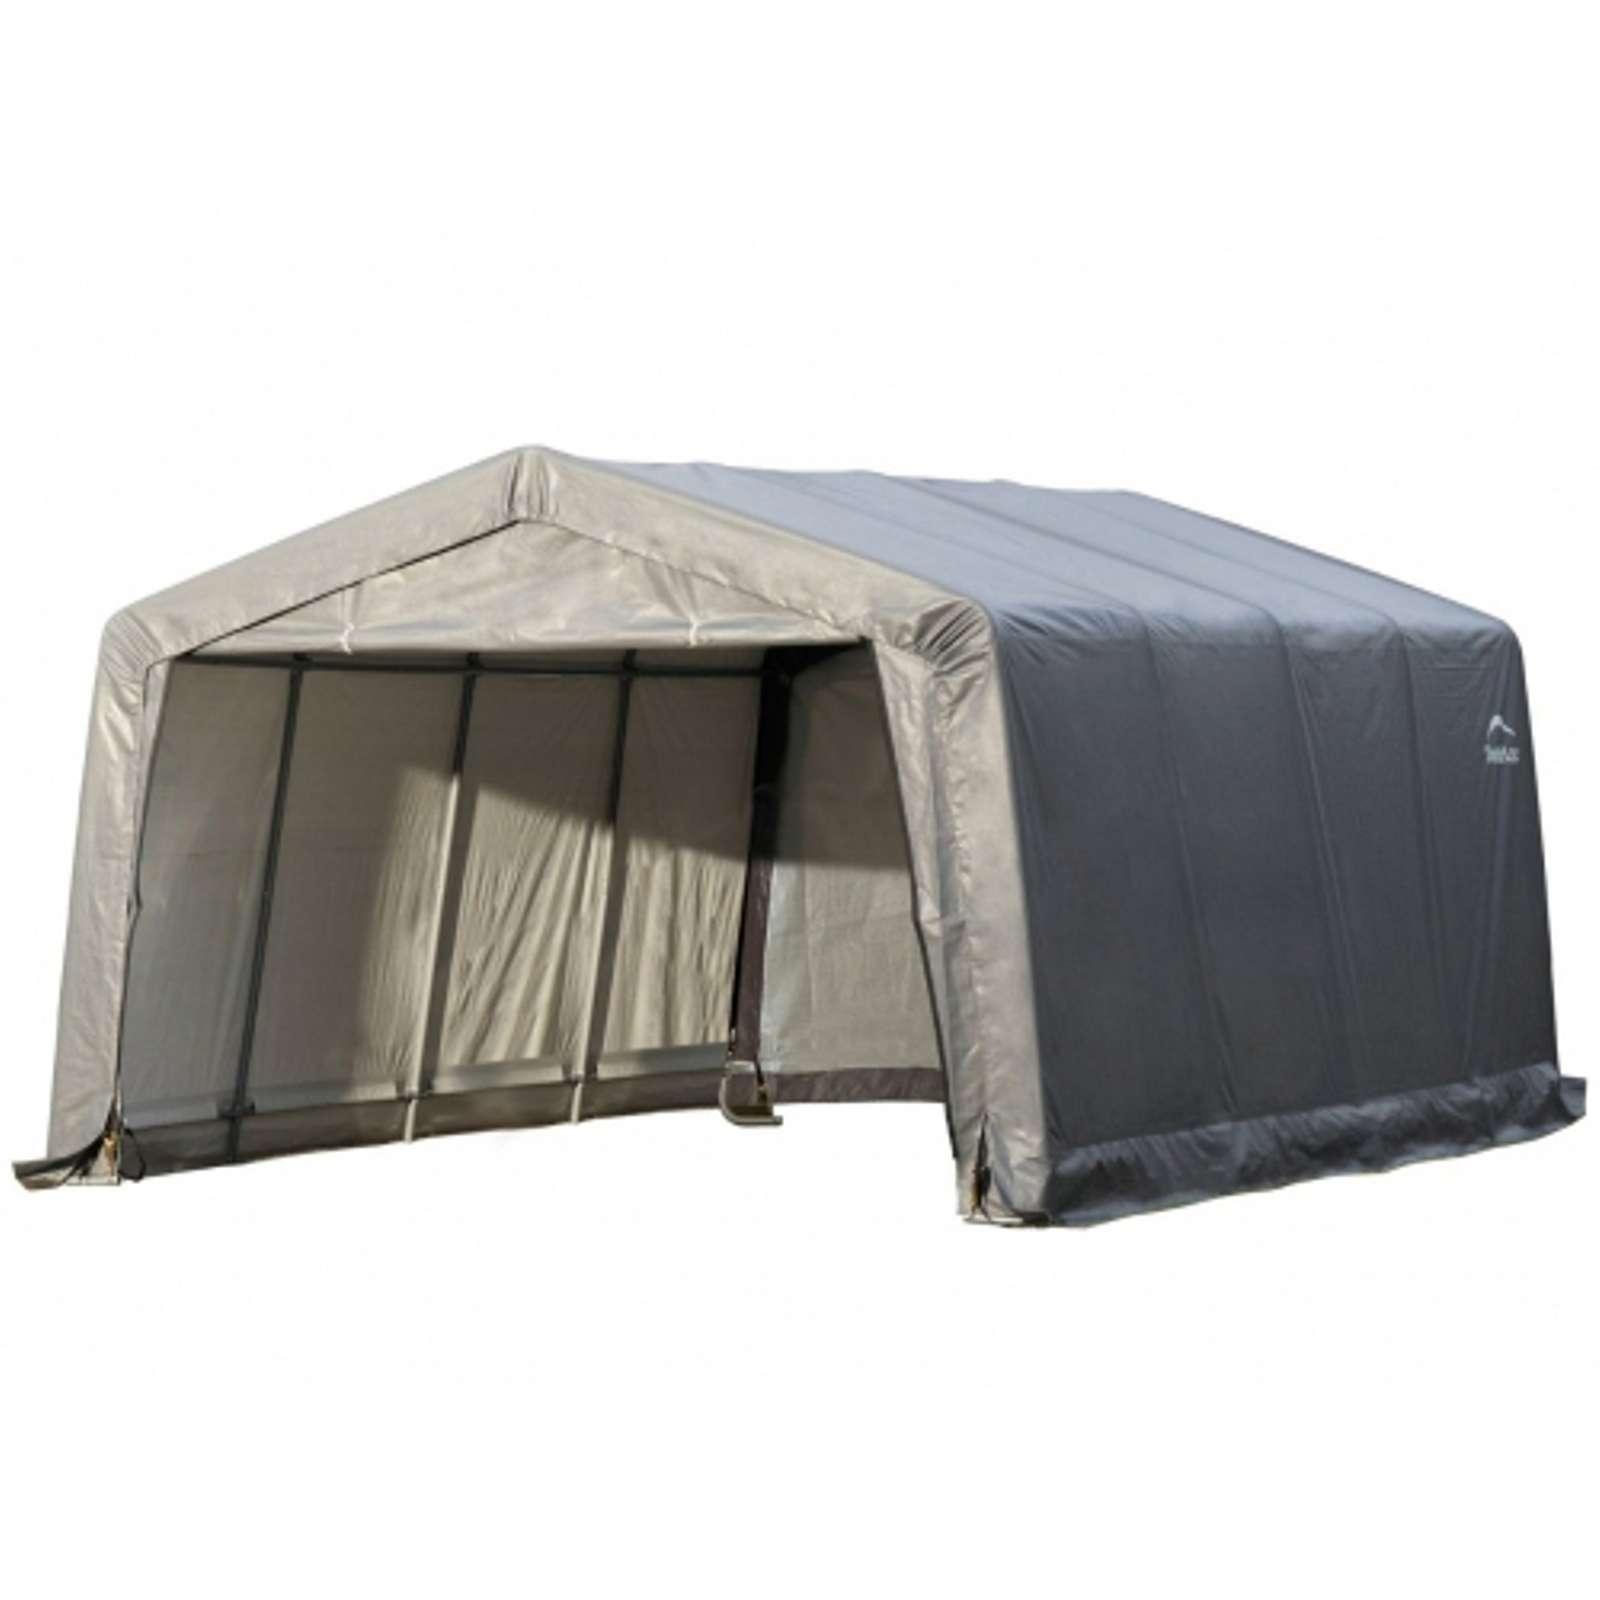 Гараж в коробке ShelterLogic 3,7x6,1x2,4м